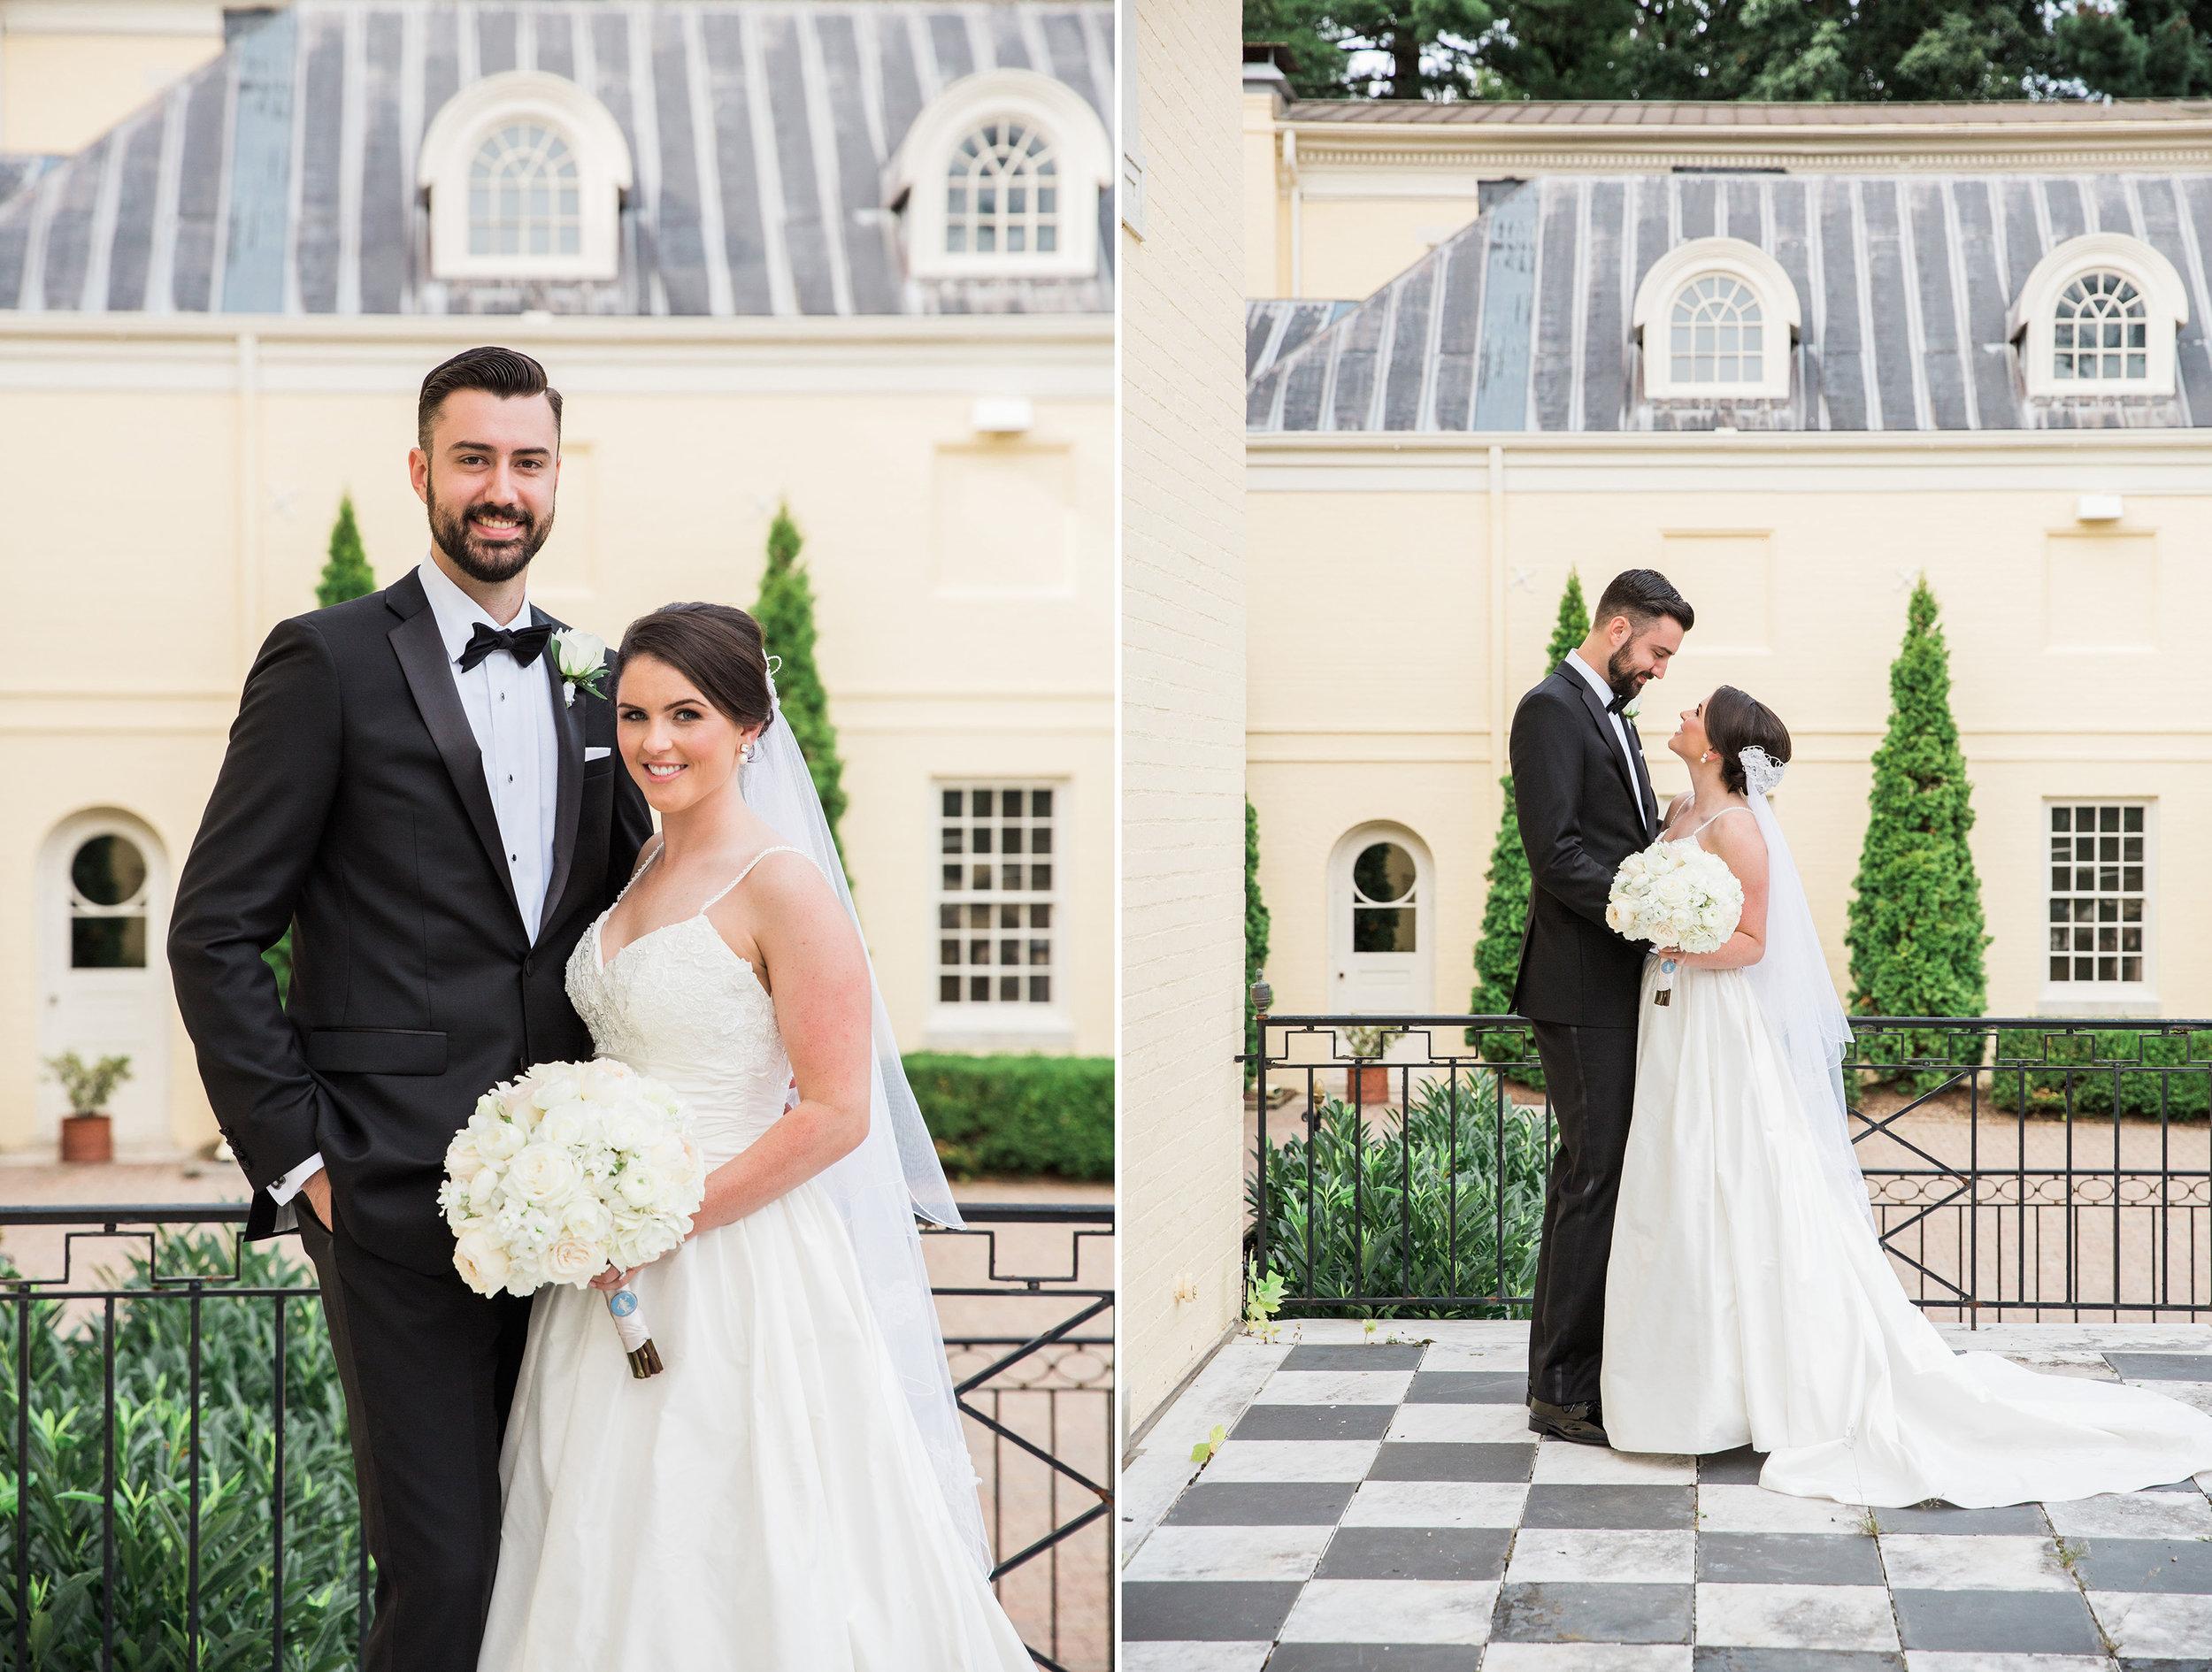 Evergreen-Museum-Balitmore-Maryland-Wedding-Black-Tie-Bride-022.jpg